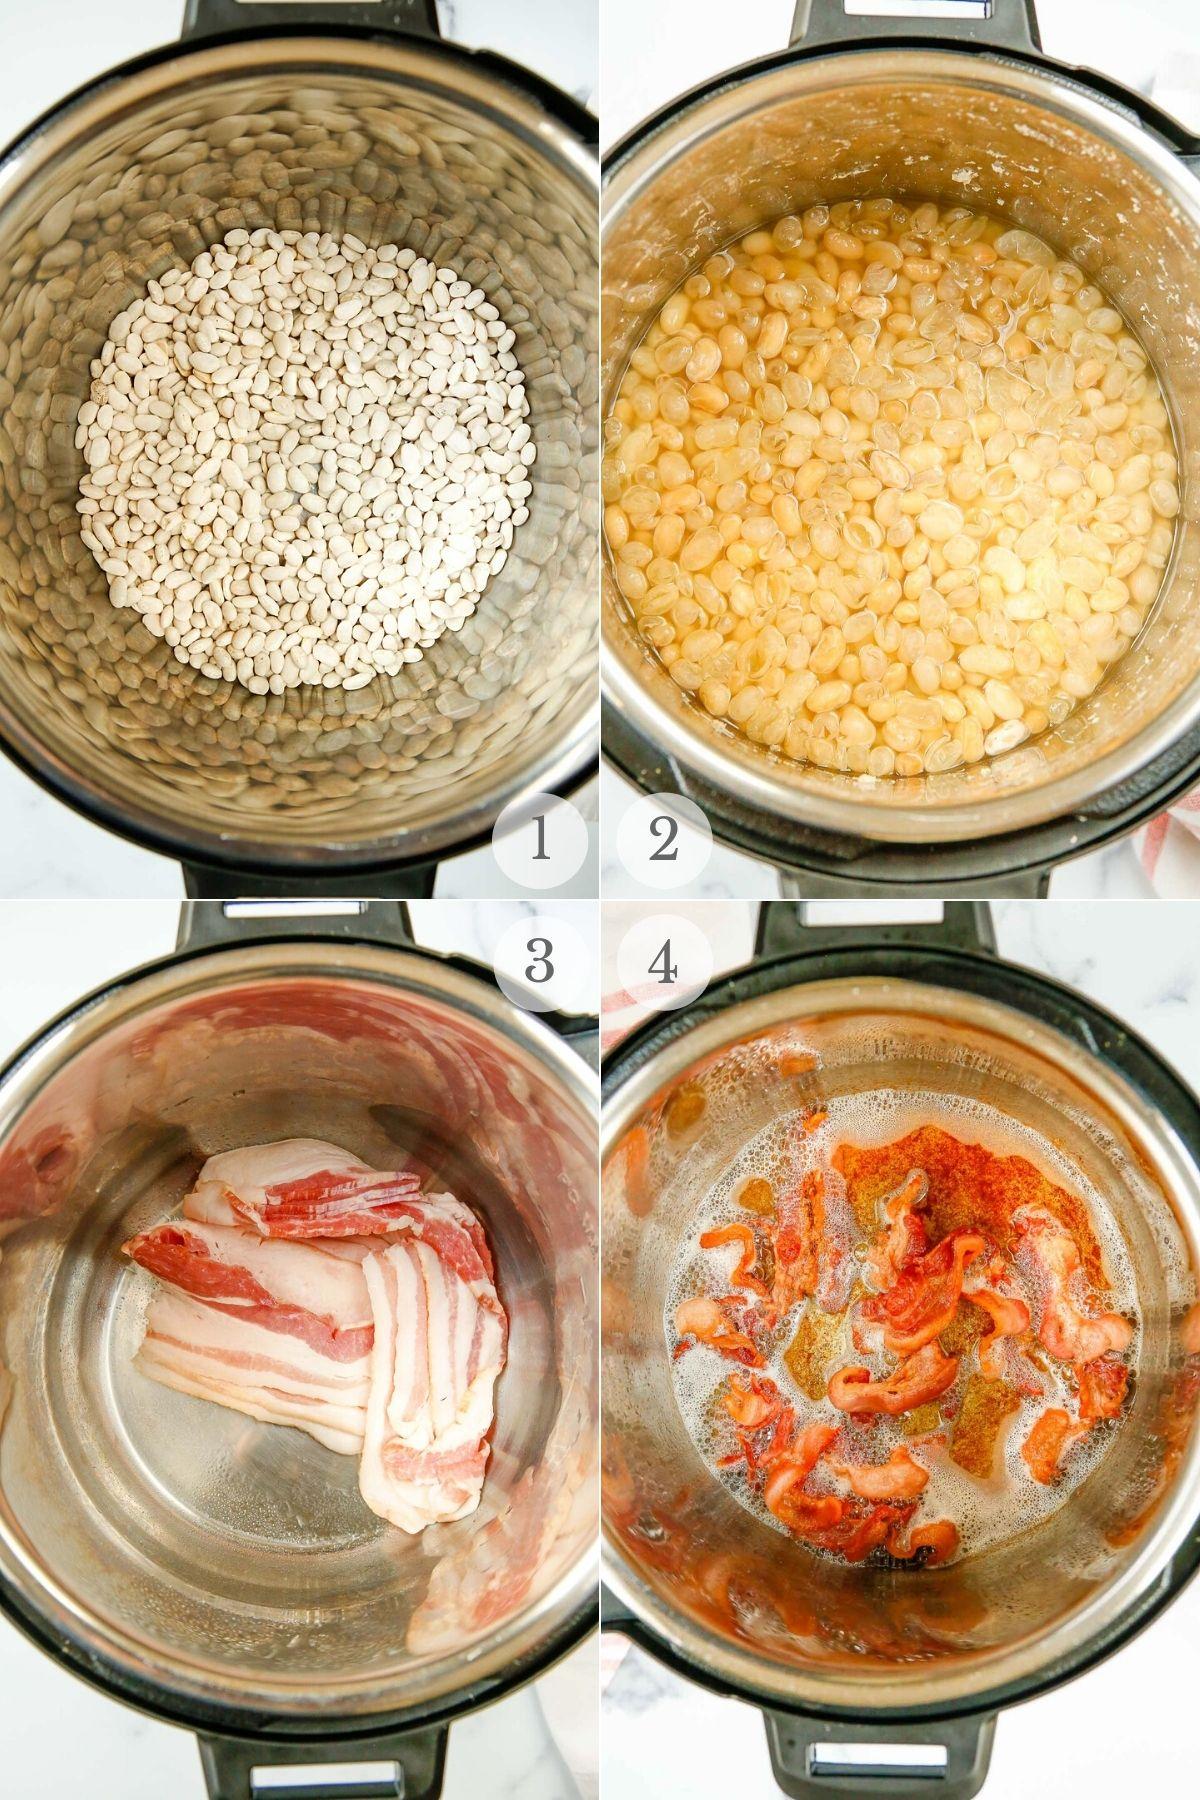 instant pot baked beans recipe steps 1-4